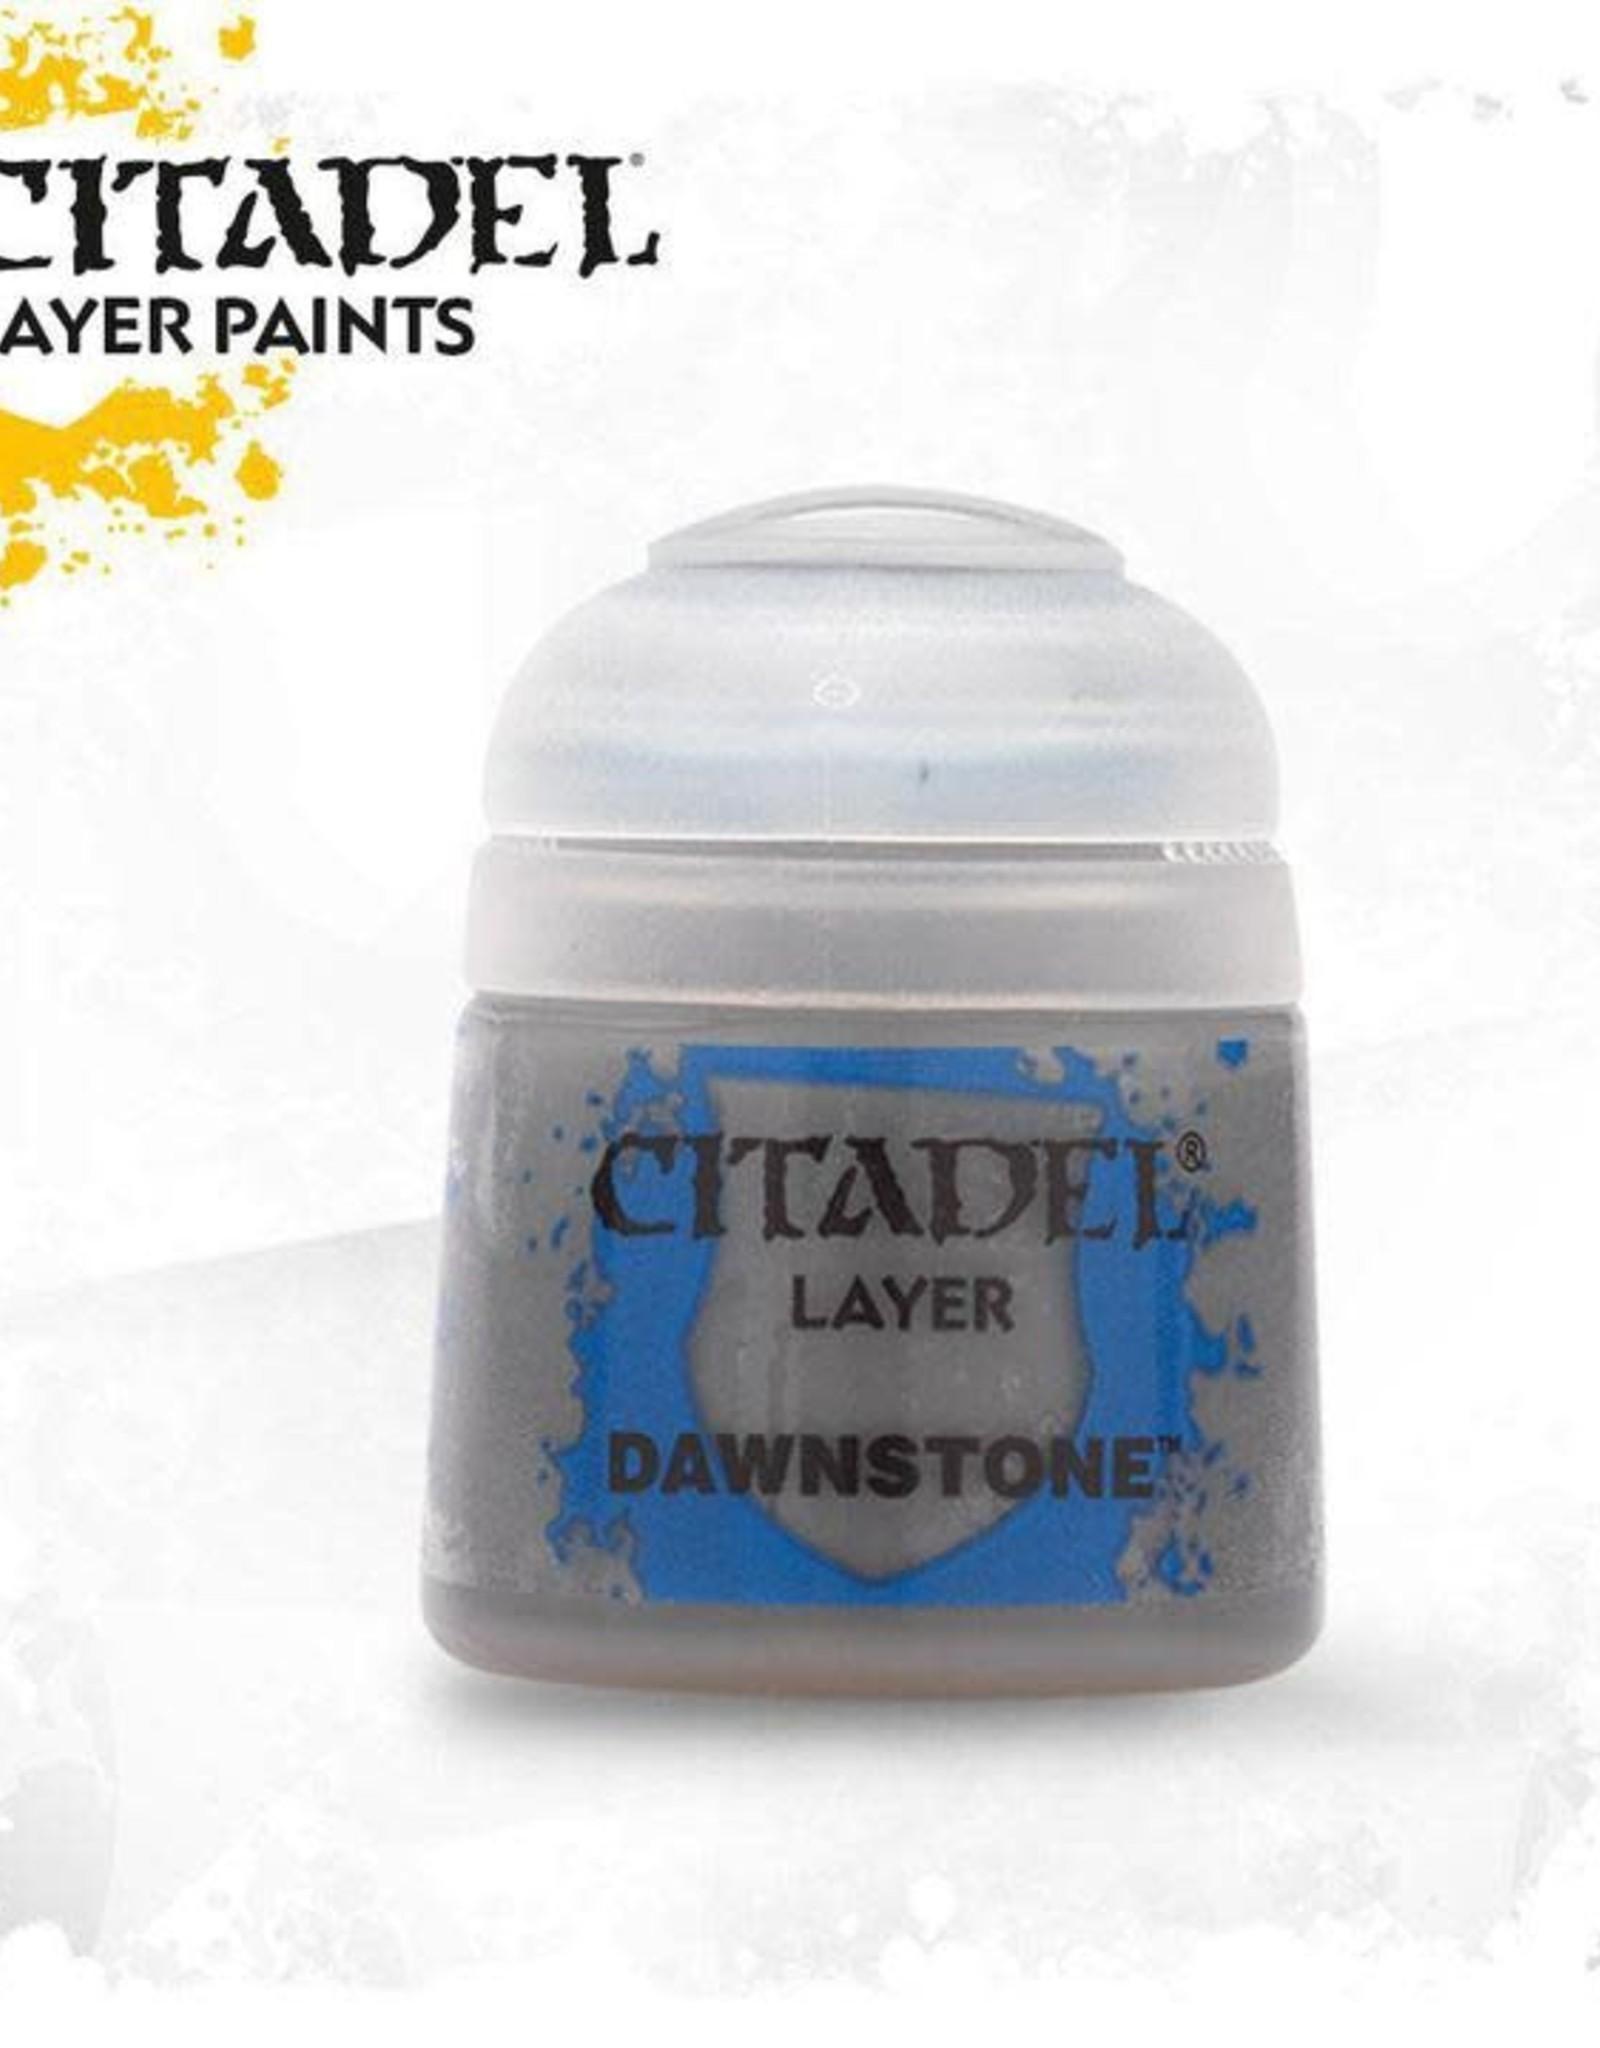 Games Workshop Citadel Paint: Dry - Dawnstone